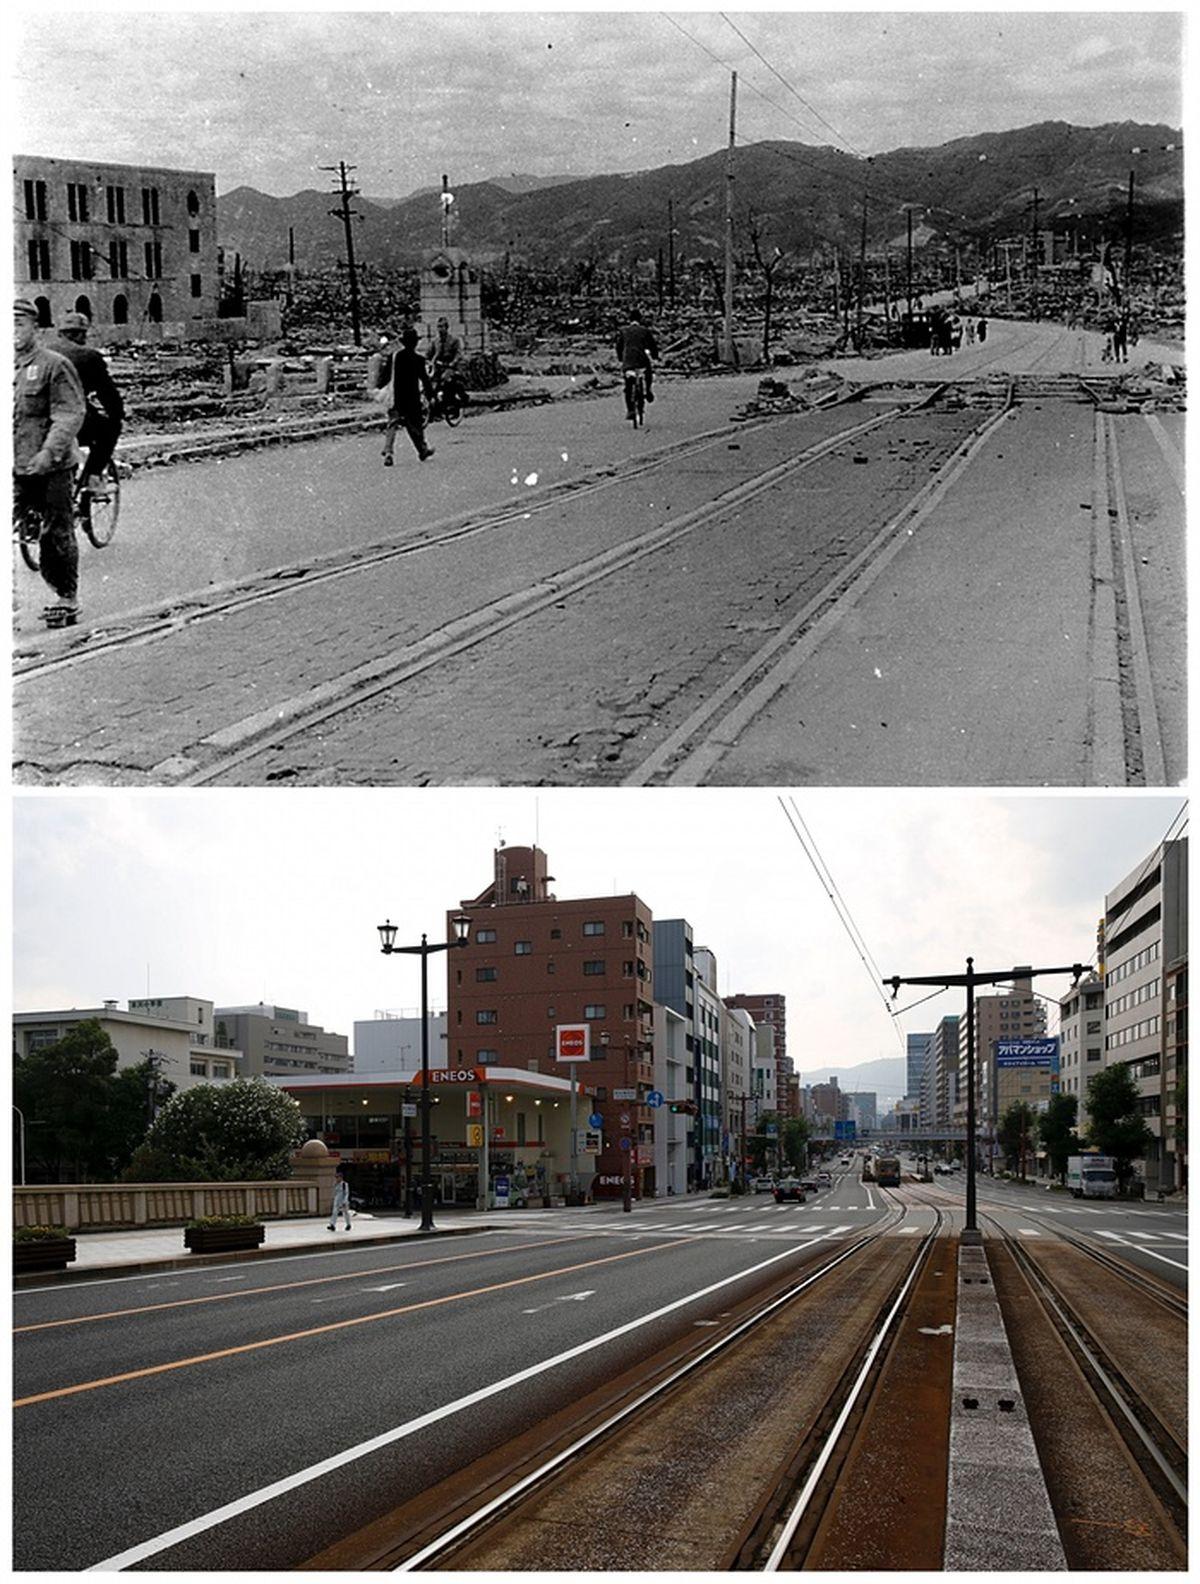 55c36297bce26_ResidentswalknearAioiBridgeinHiroshima,October1945,andthebridgetoday.rutersOK.jpg